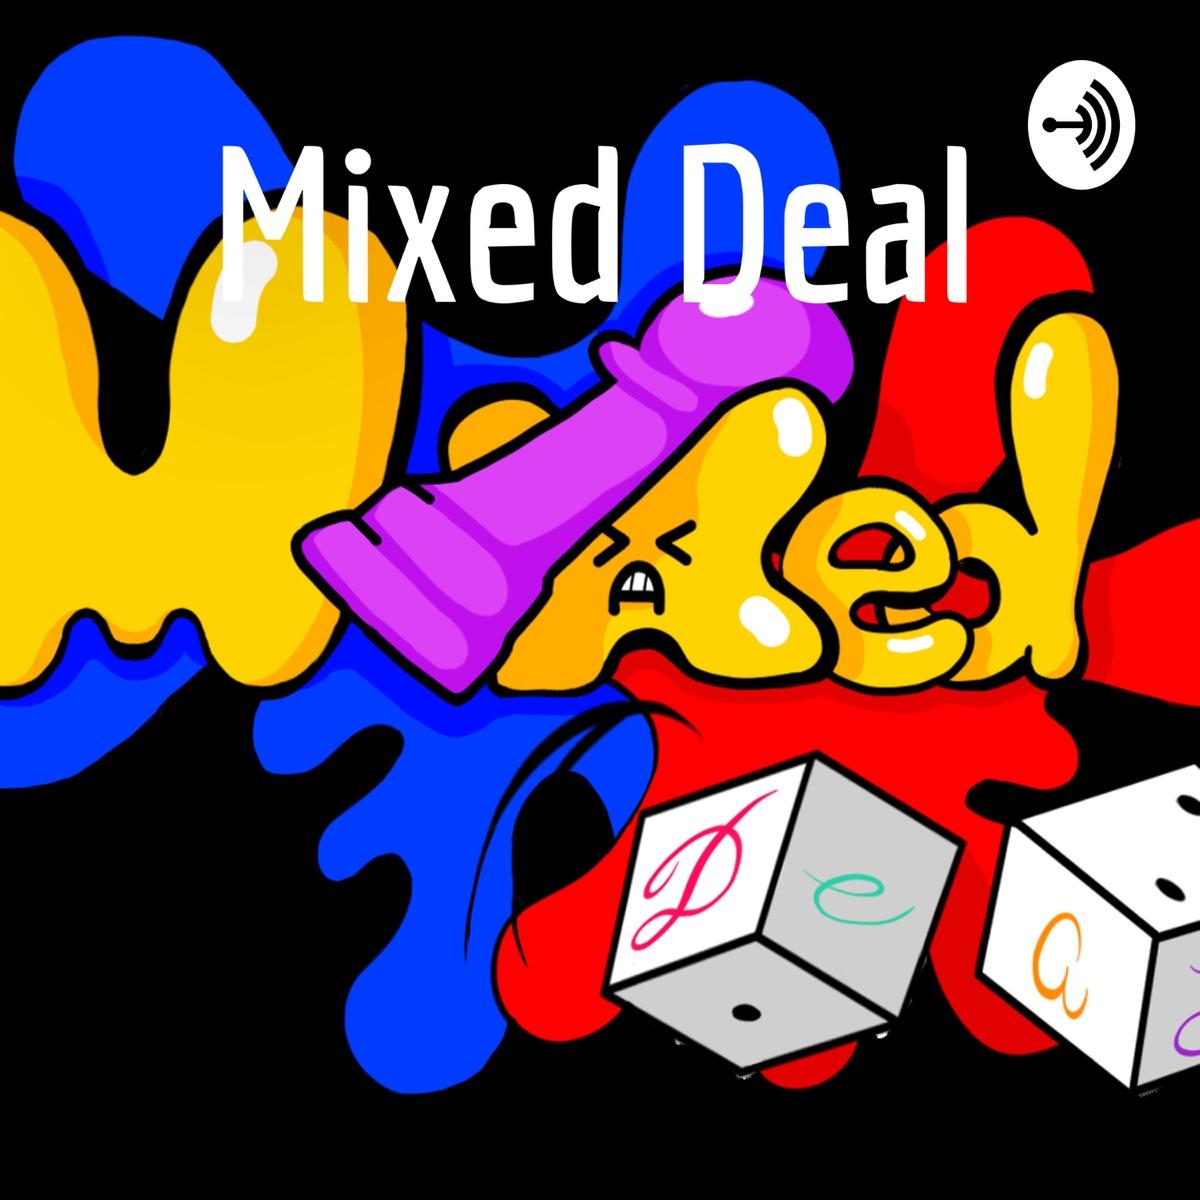 Mixed Deal